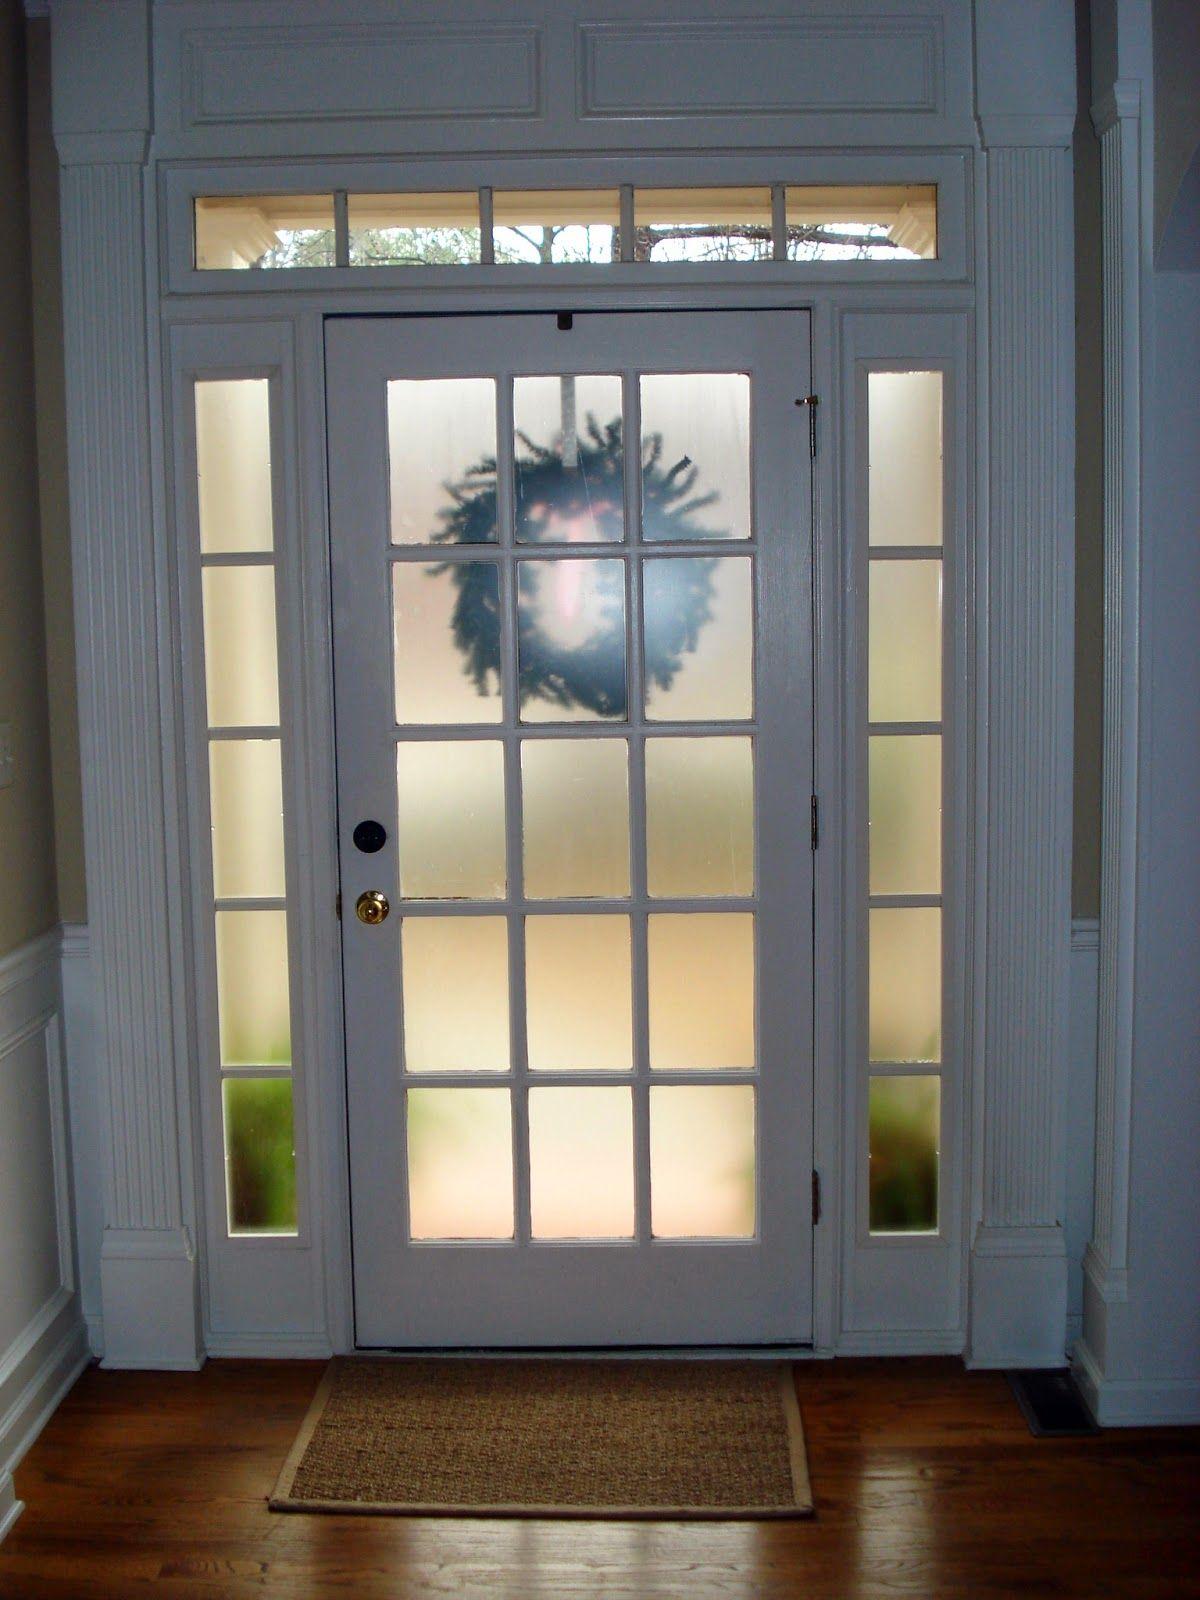 Before Meets After How To Make Your Front Door More Private Door Glass Inserts Front Doors With Windows Exterior Doors